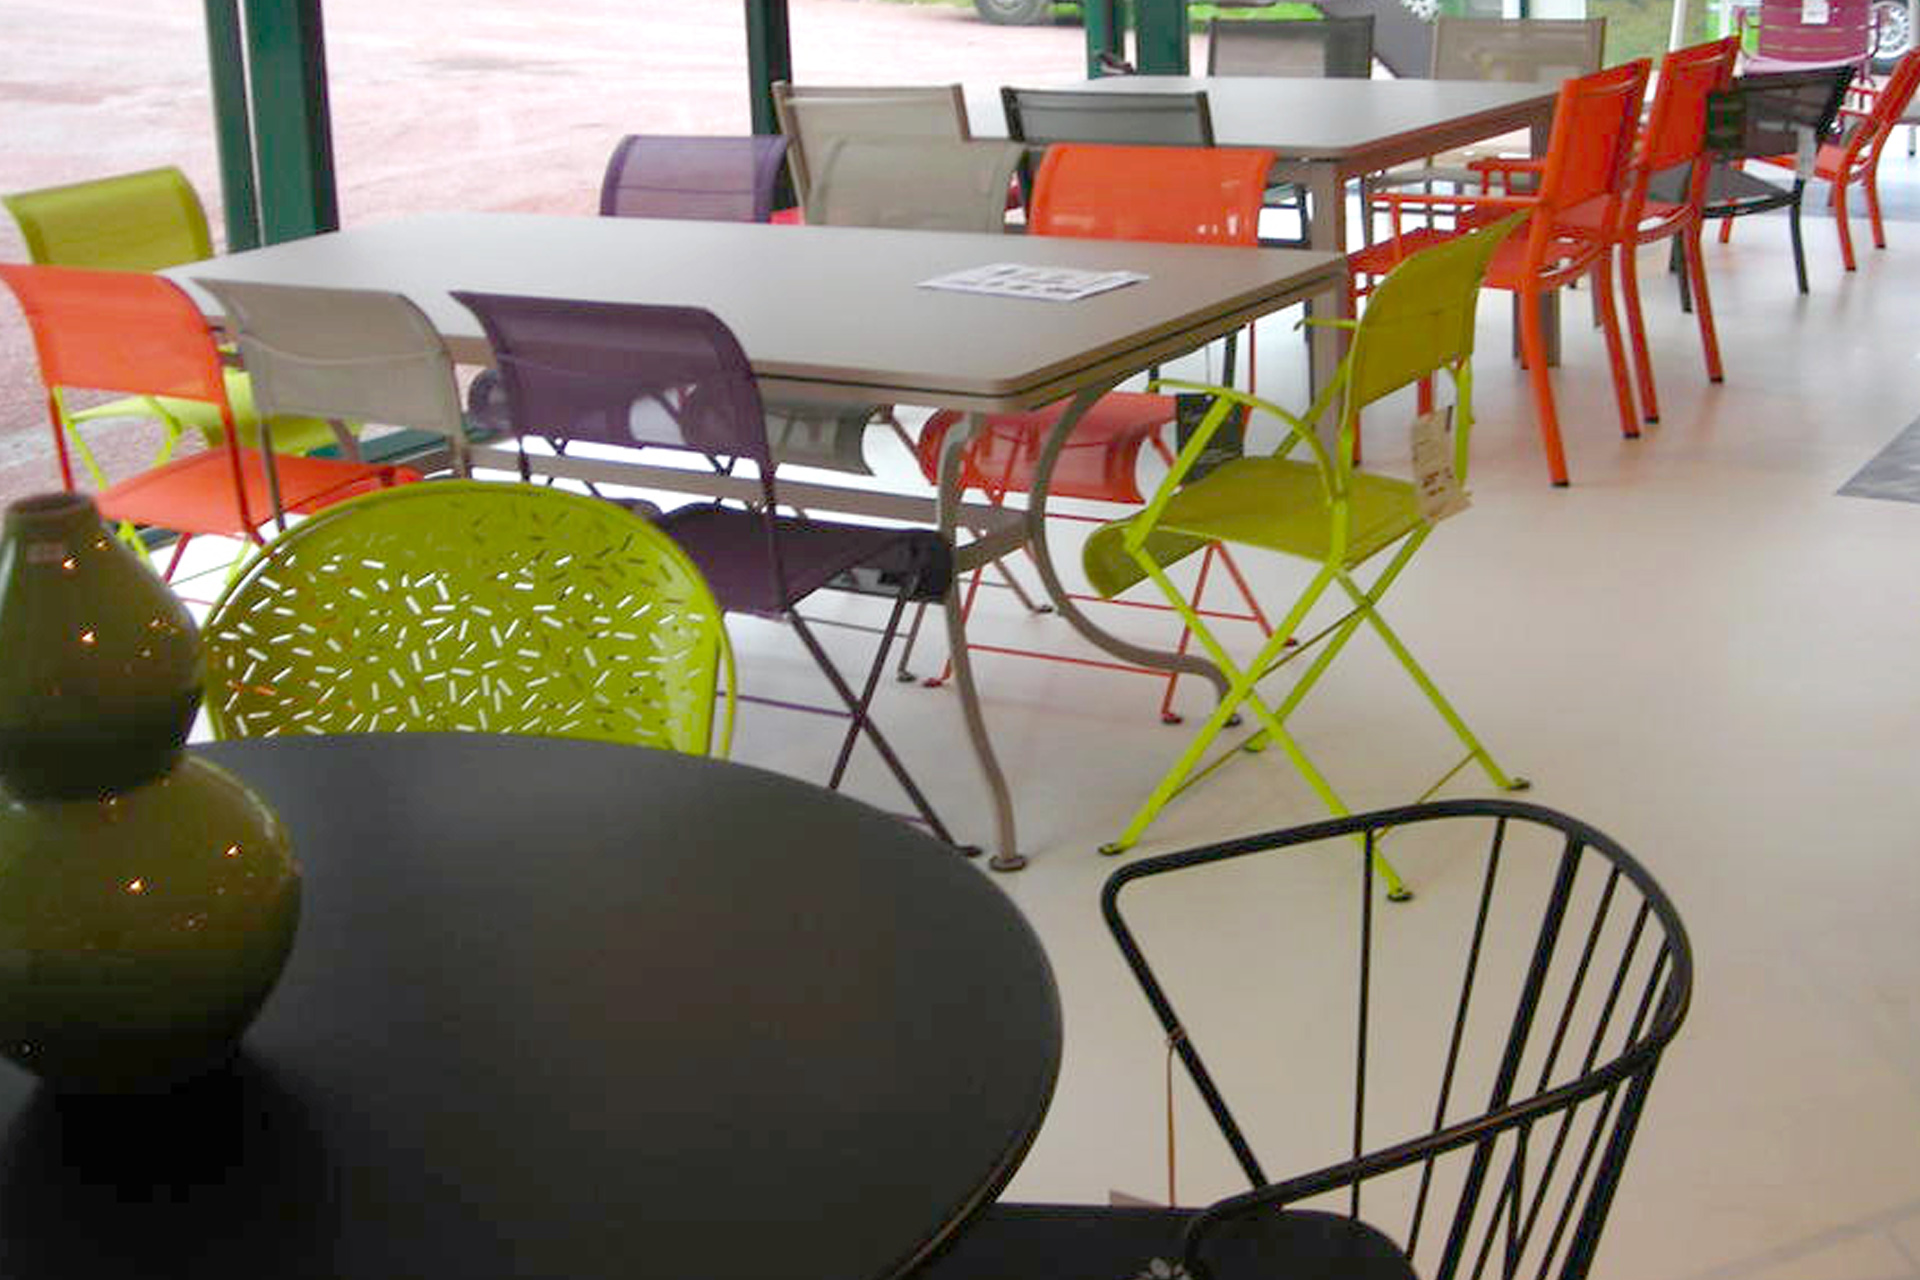 Salon de jardin style fermob - Mailleraye.fr jardin